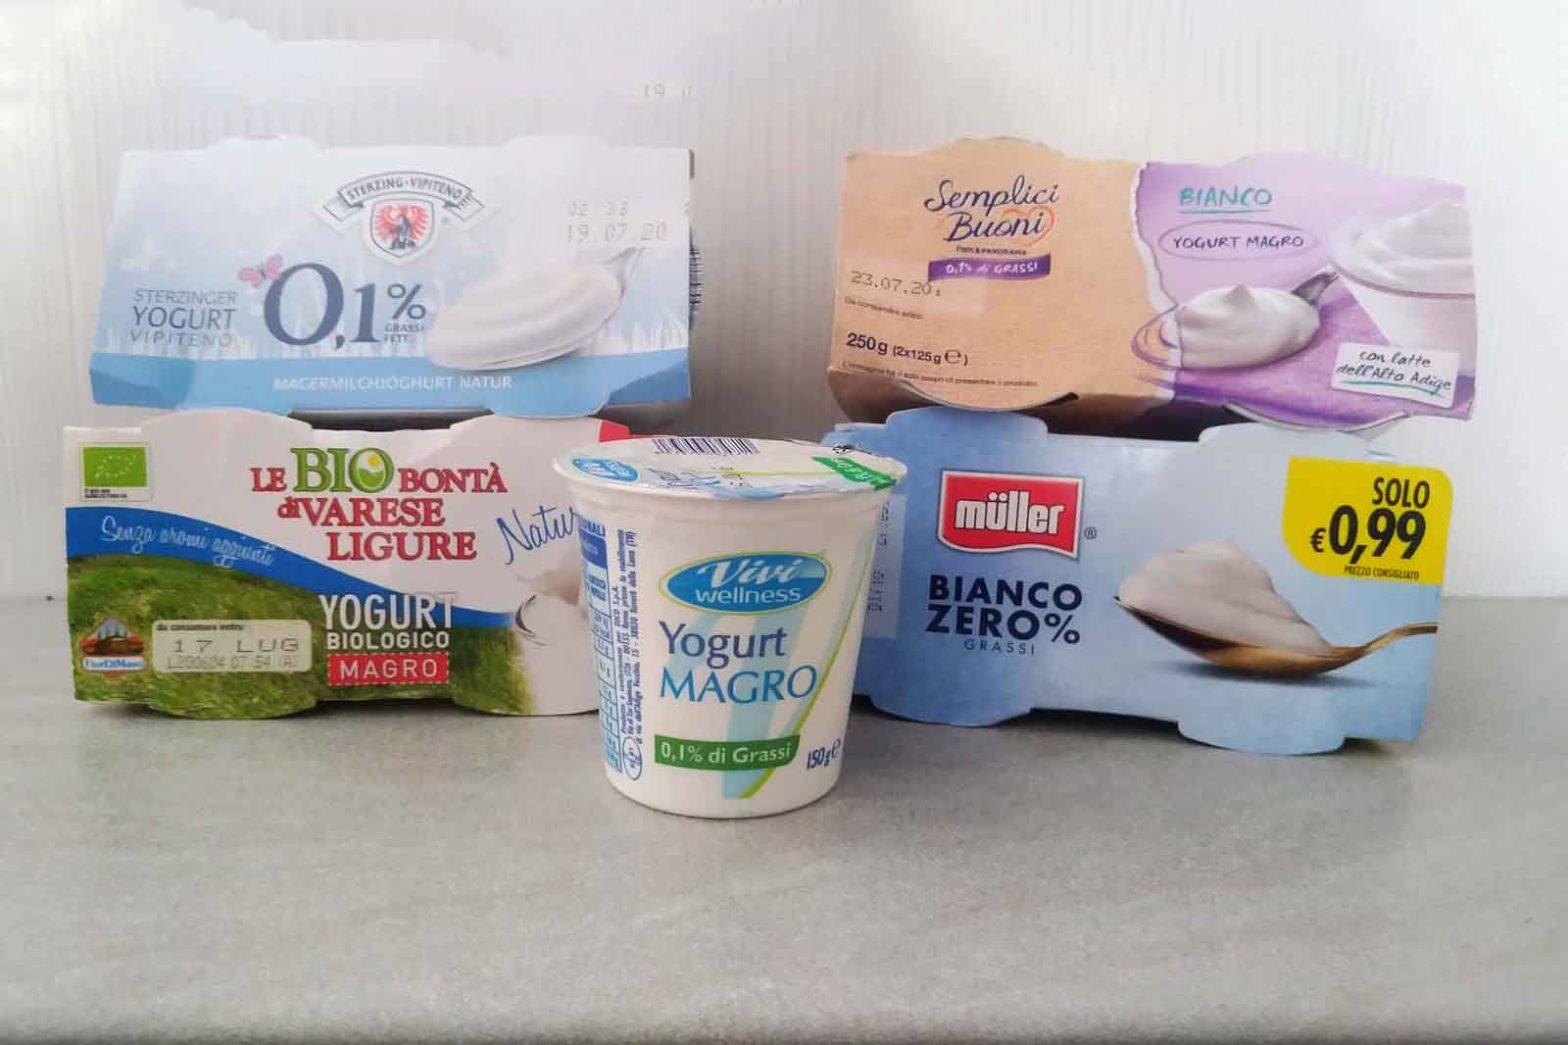 yogurt magro prova assaggio